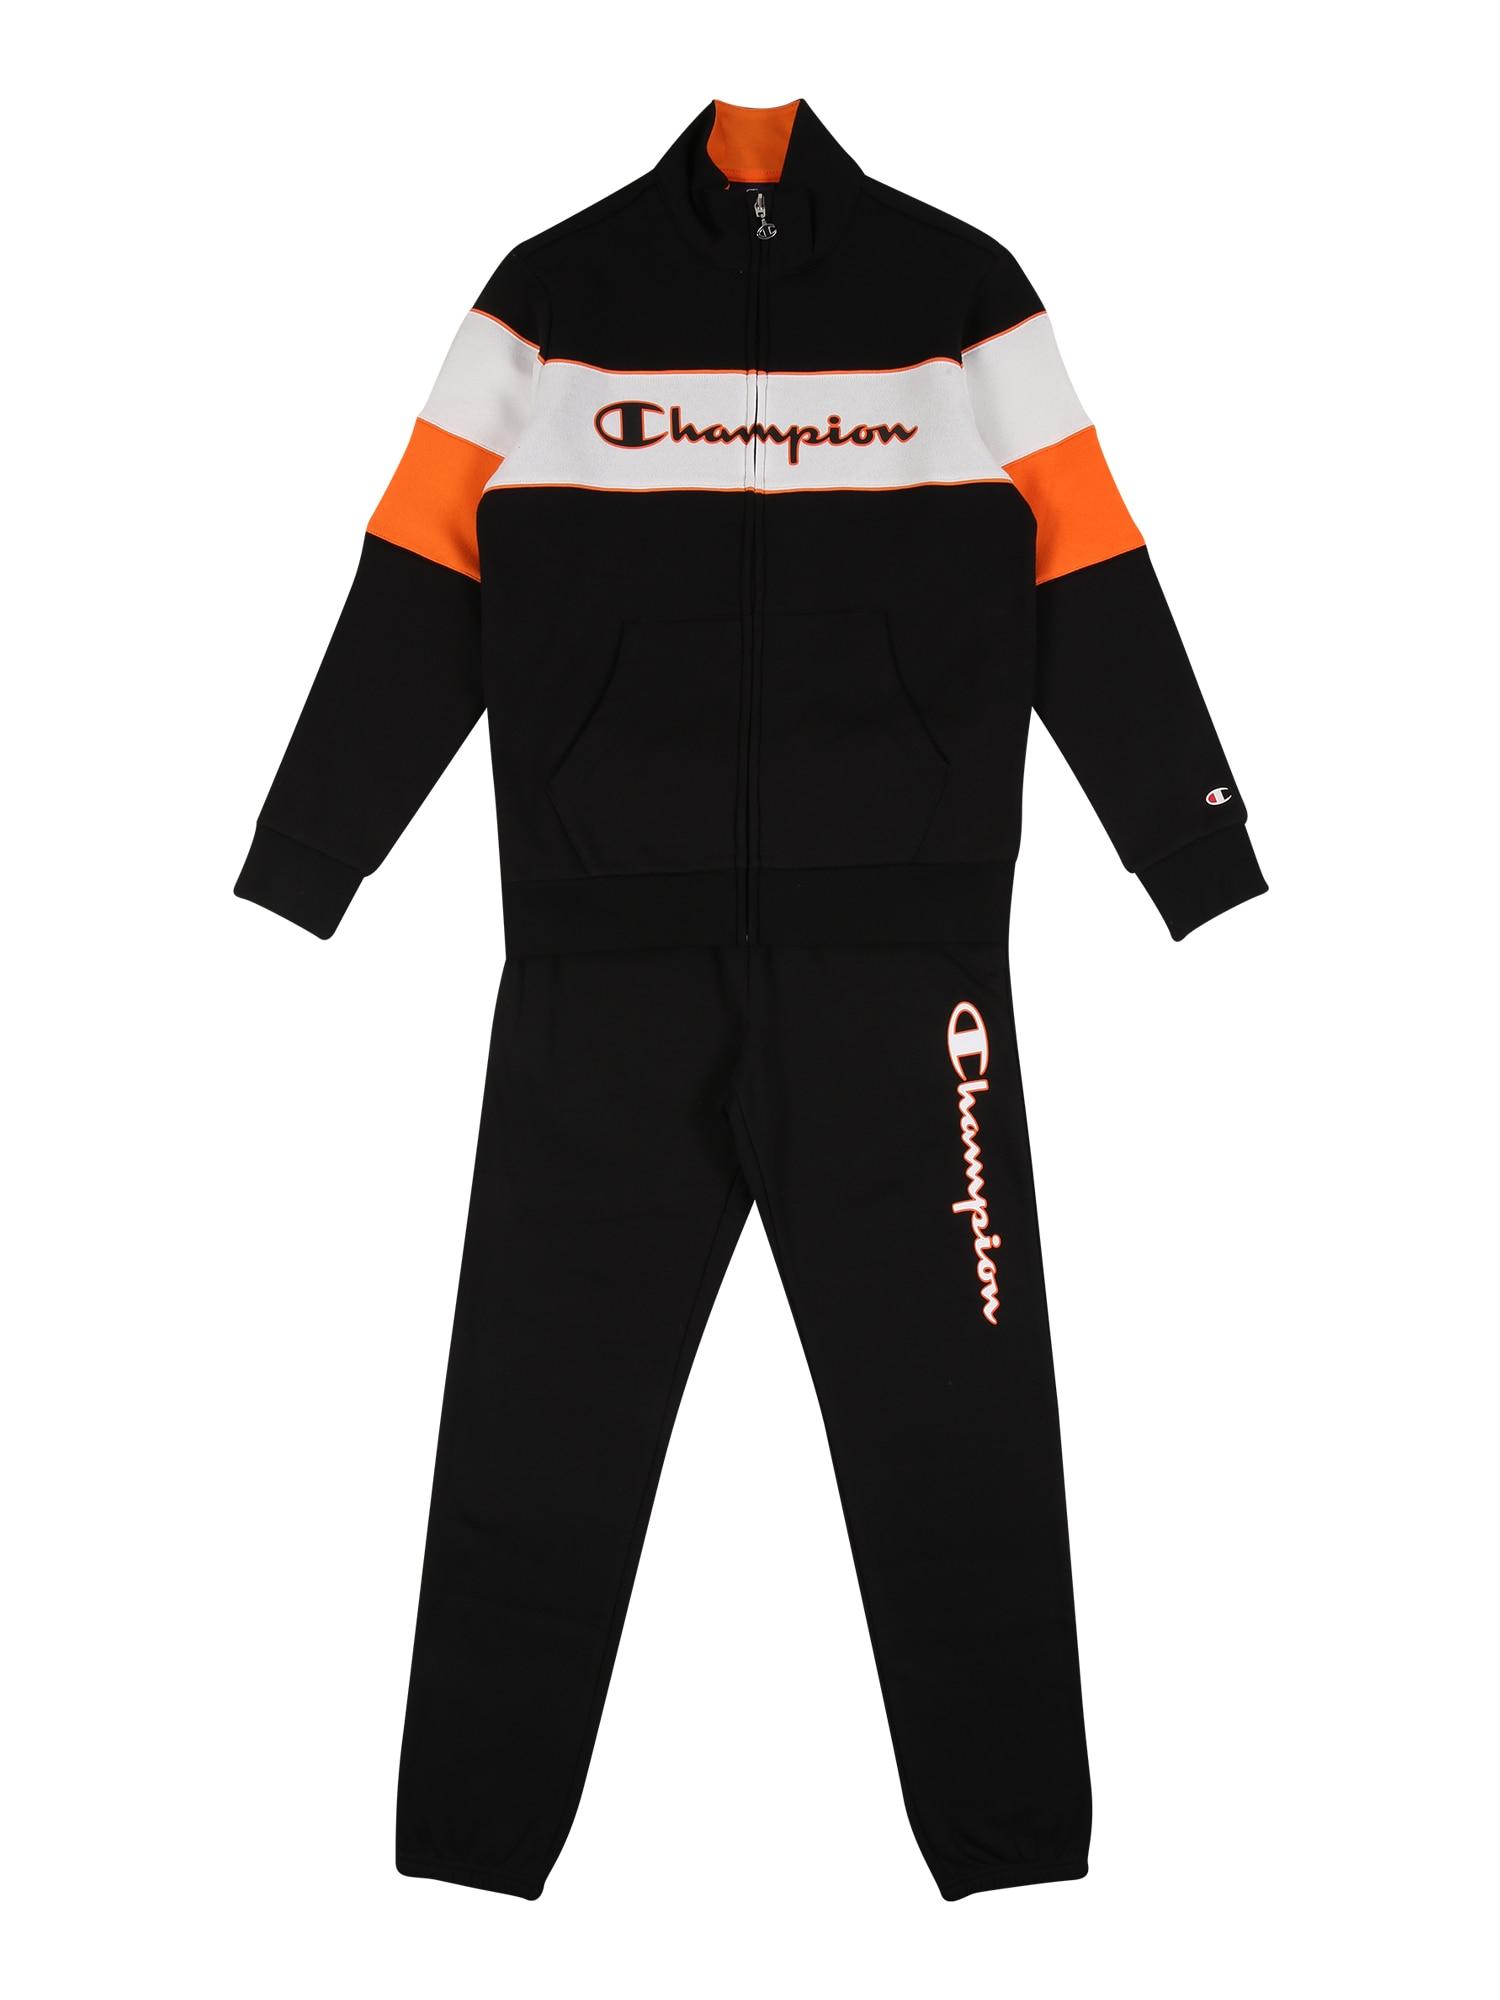 Champion Authentic Athletic Apparel Tréningový komplet  čierna / biela / oranžová